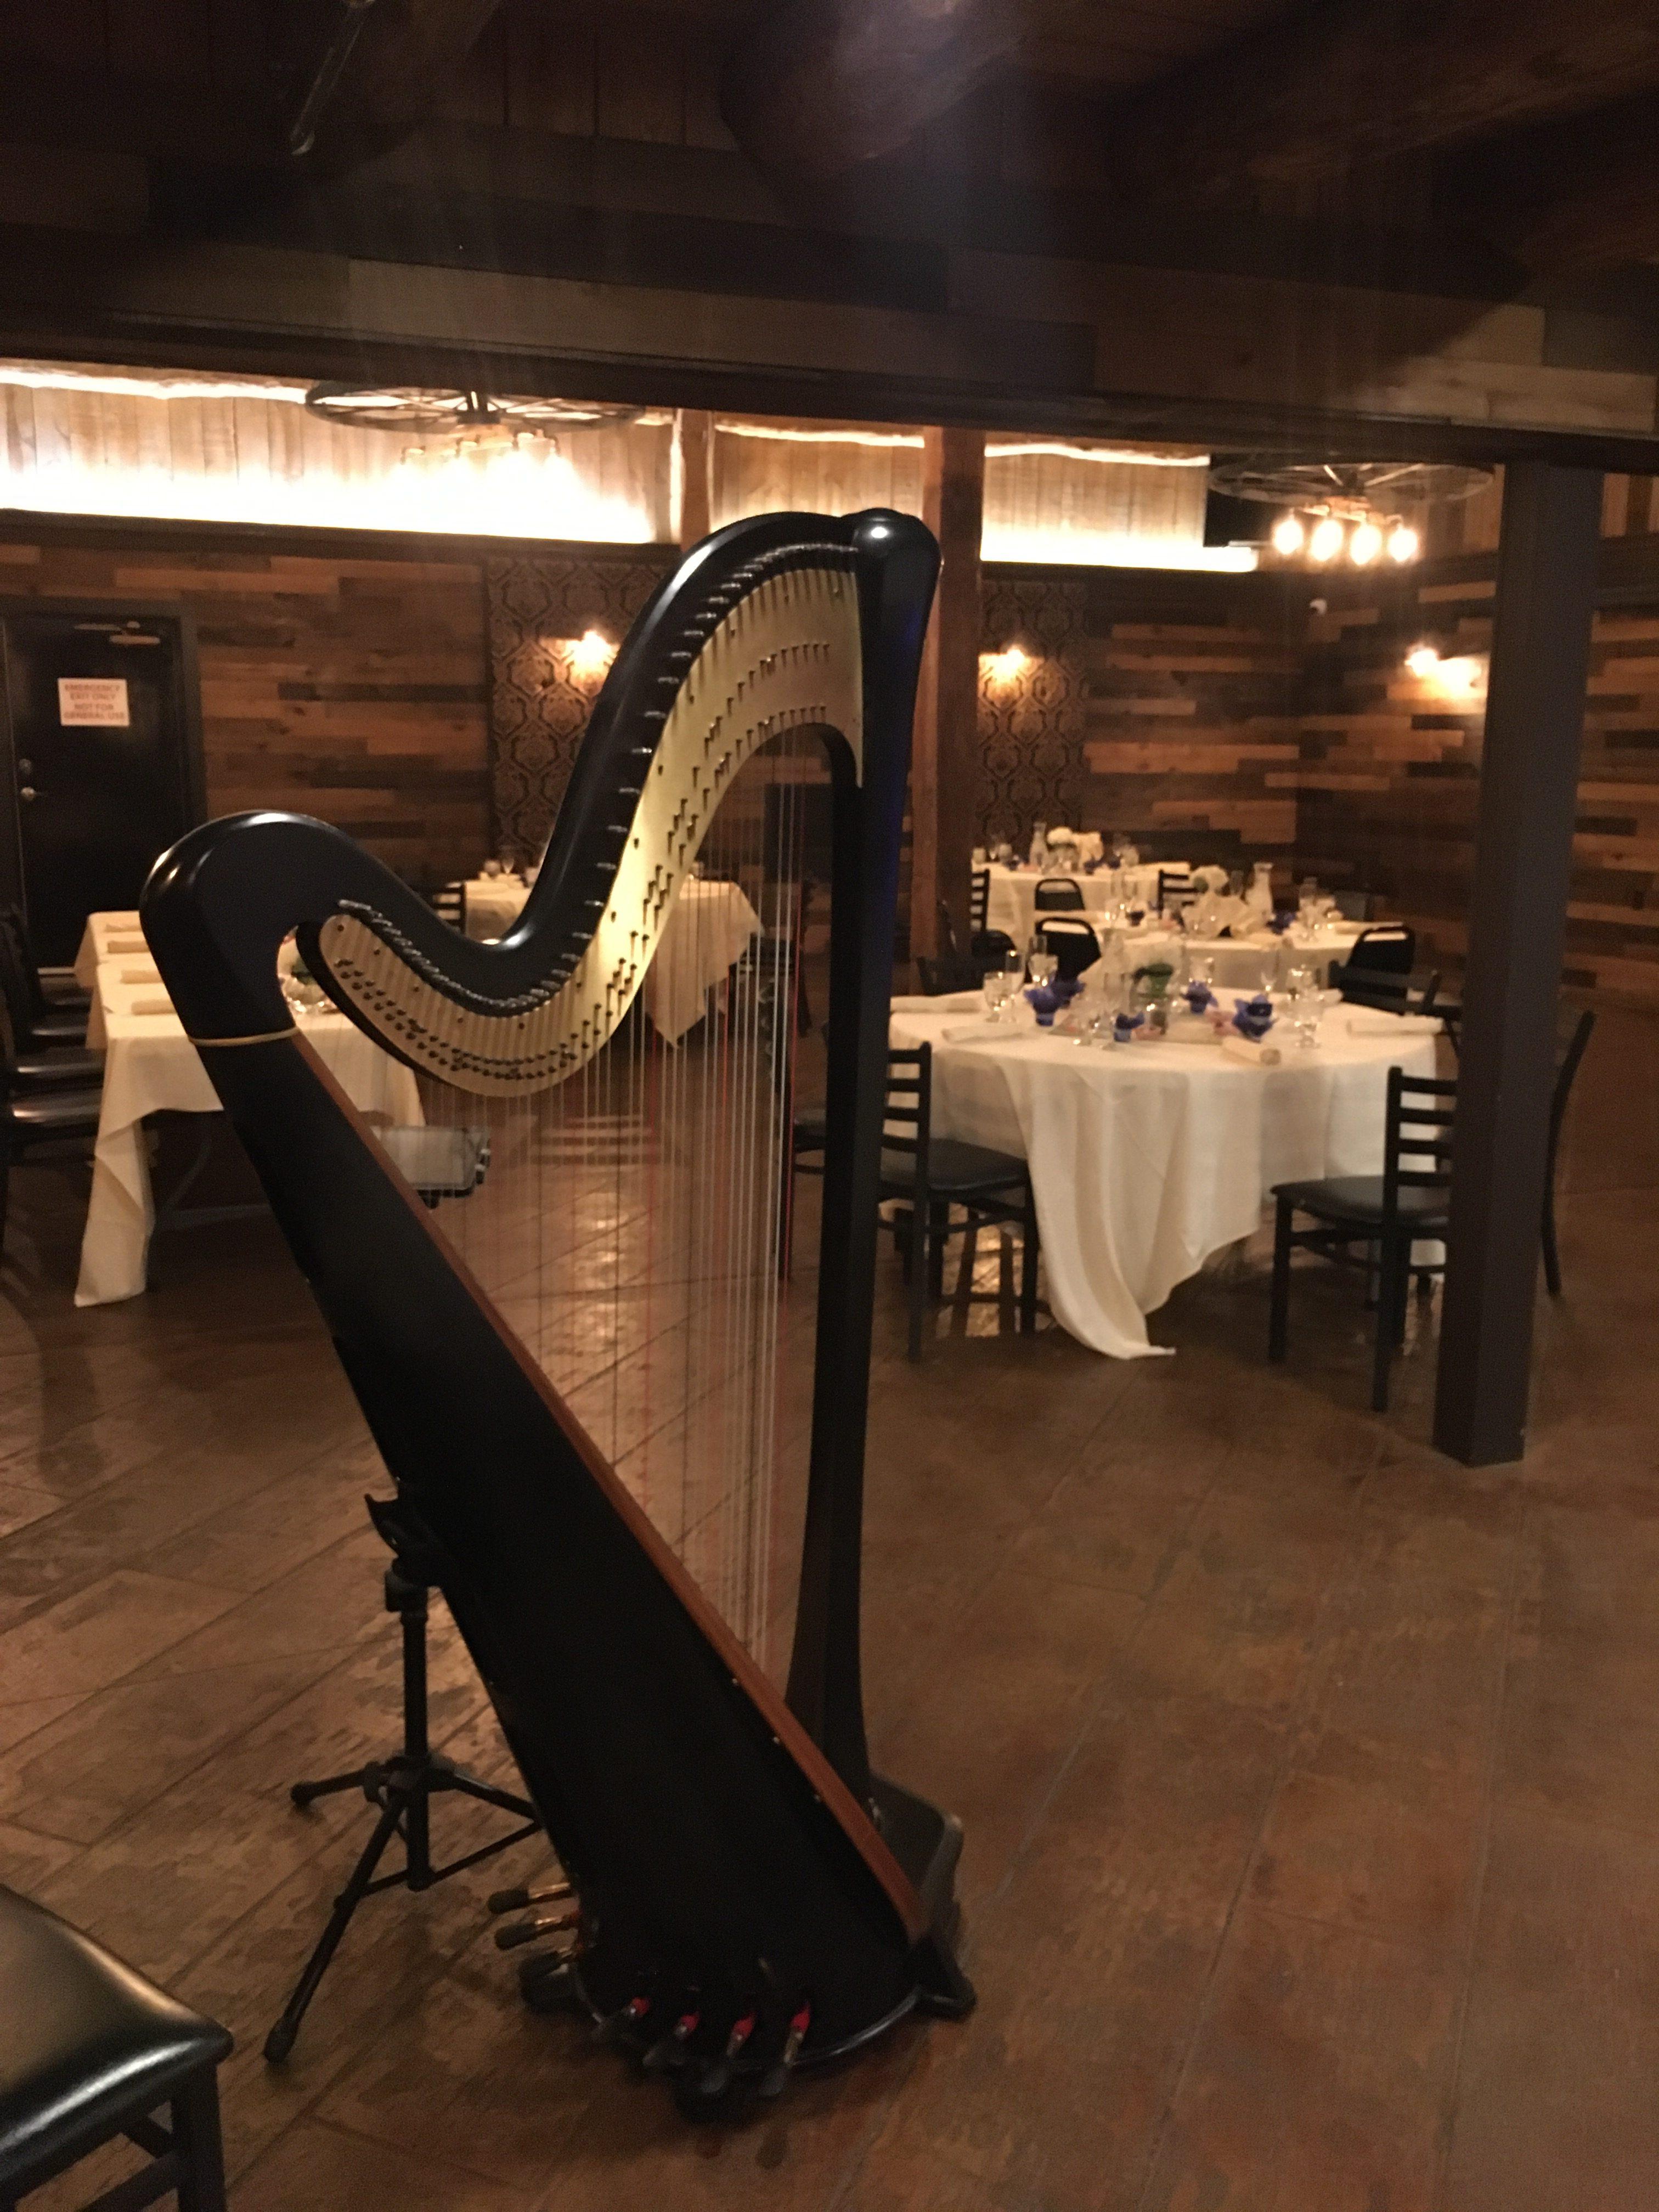 Harp in Western Wisconsin